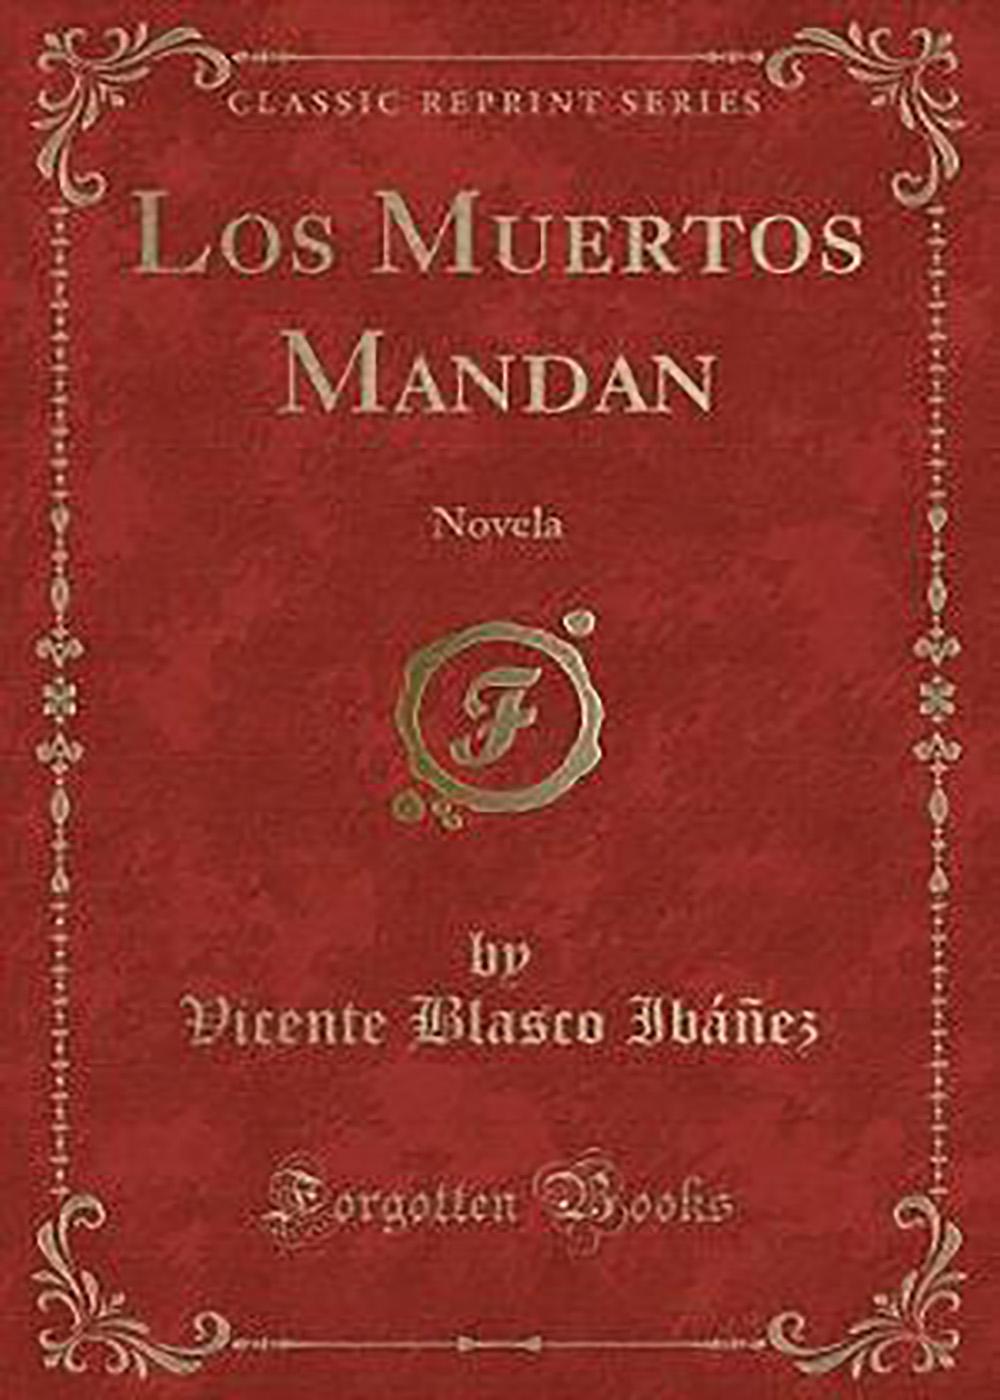 Vicente Blasco Ibáñez - Los muertos mandan